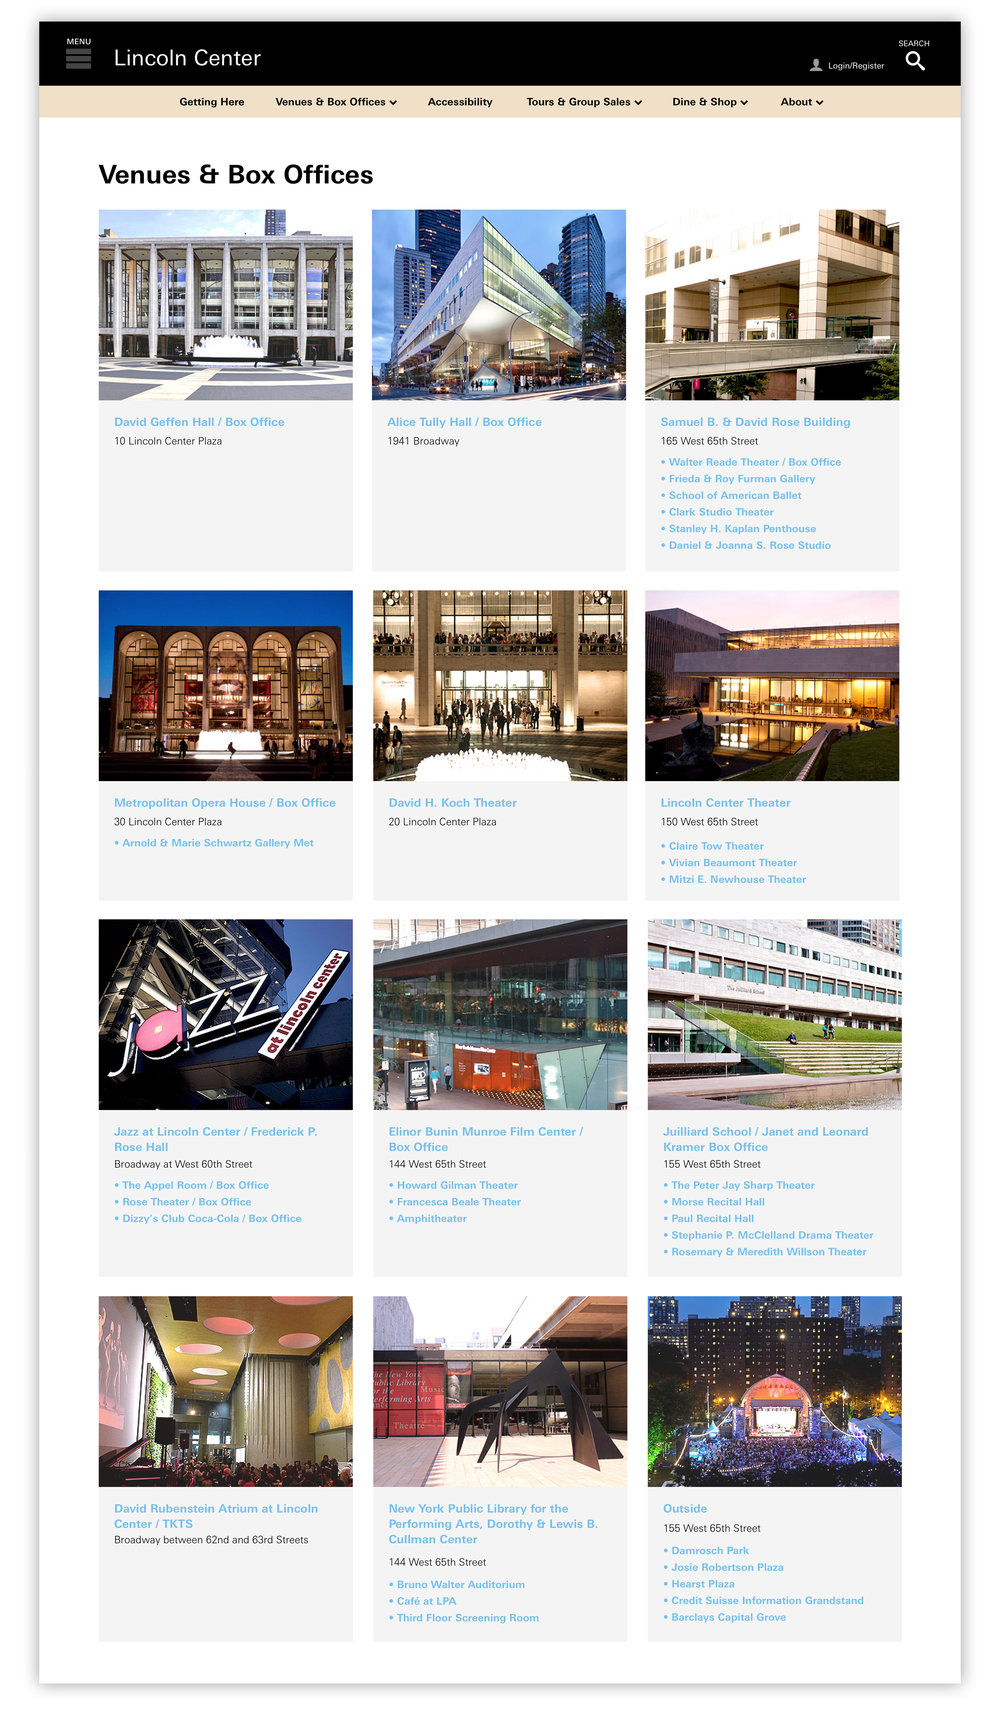 venues-box-offices-visit-desktop.jpg